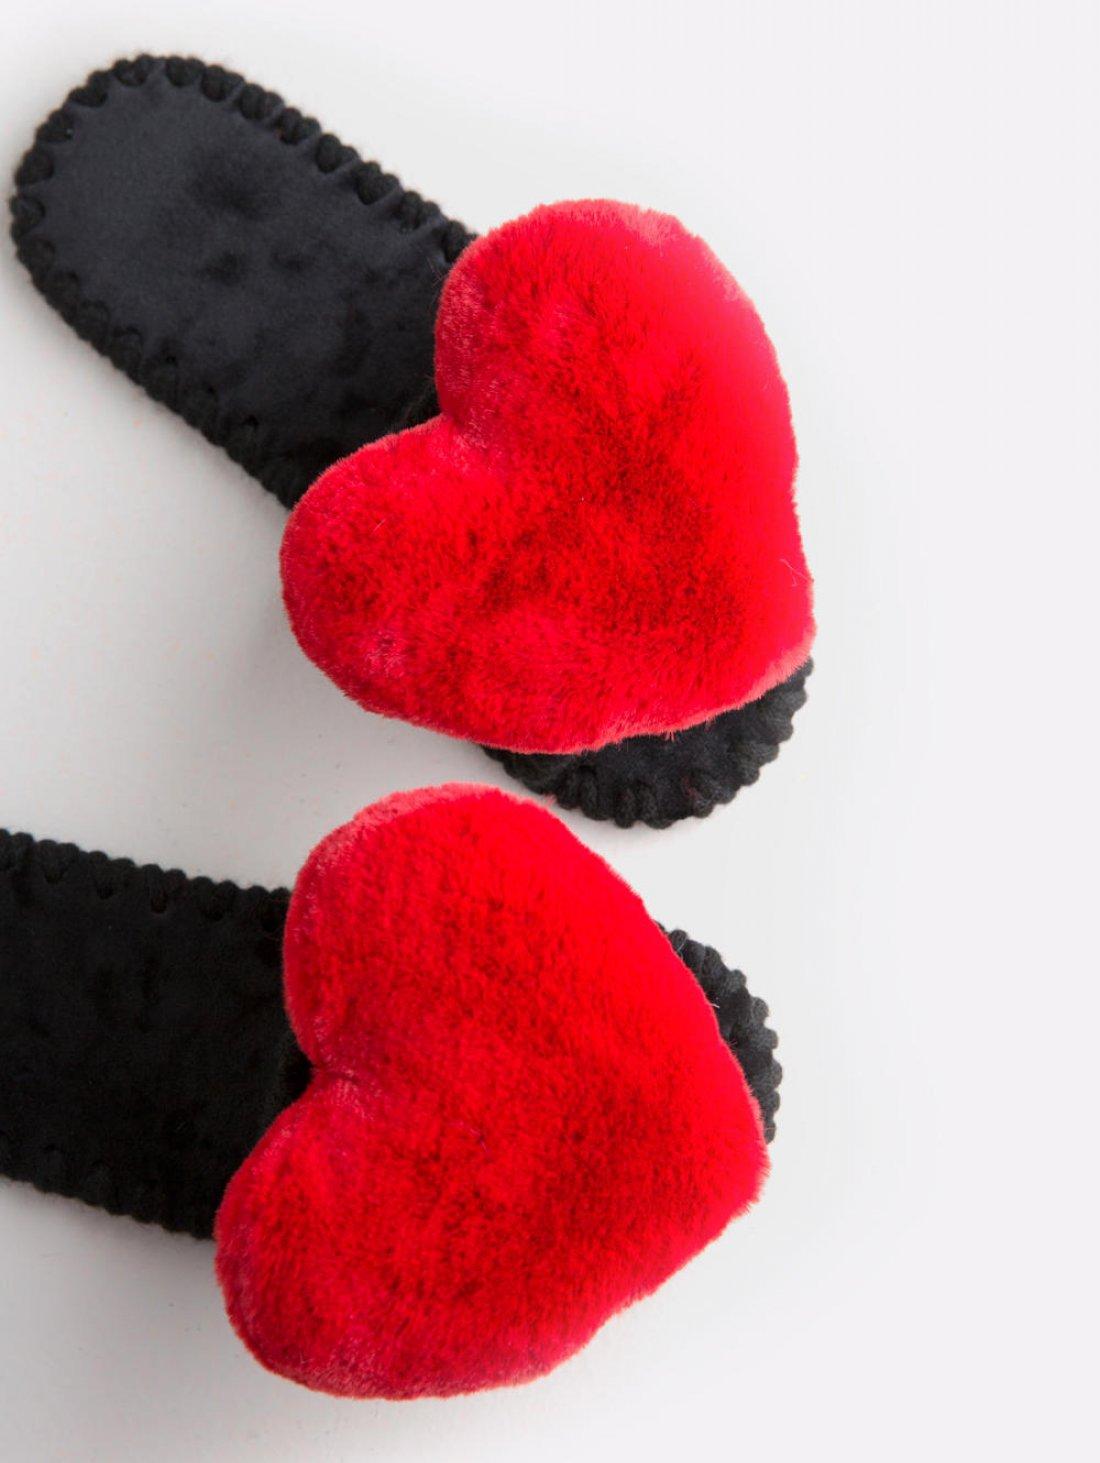 Женские домашние тапочки с сердечками цвета Кардинал, Family Story - 3